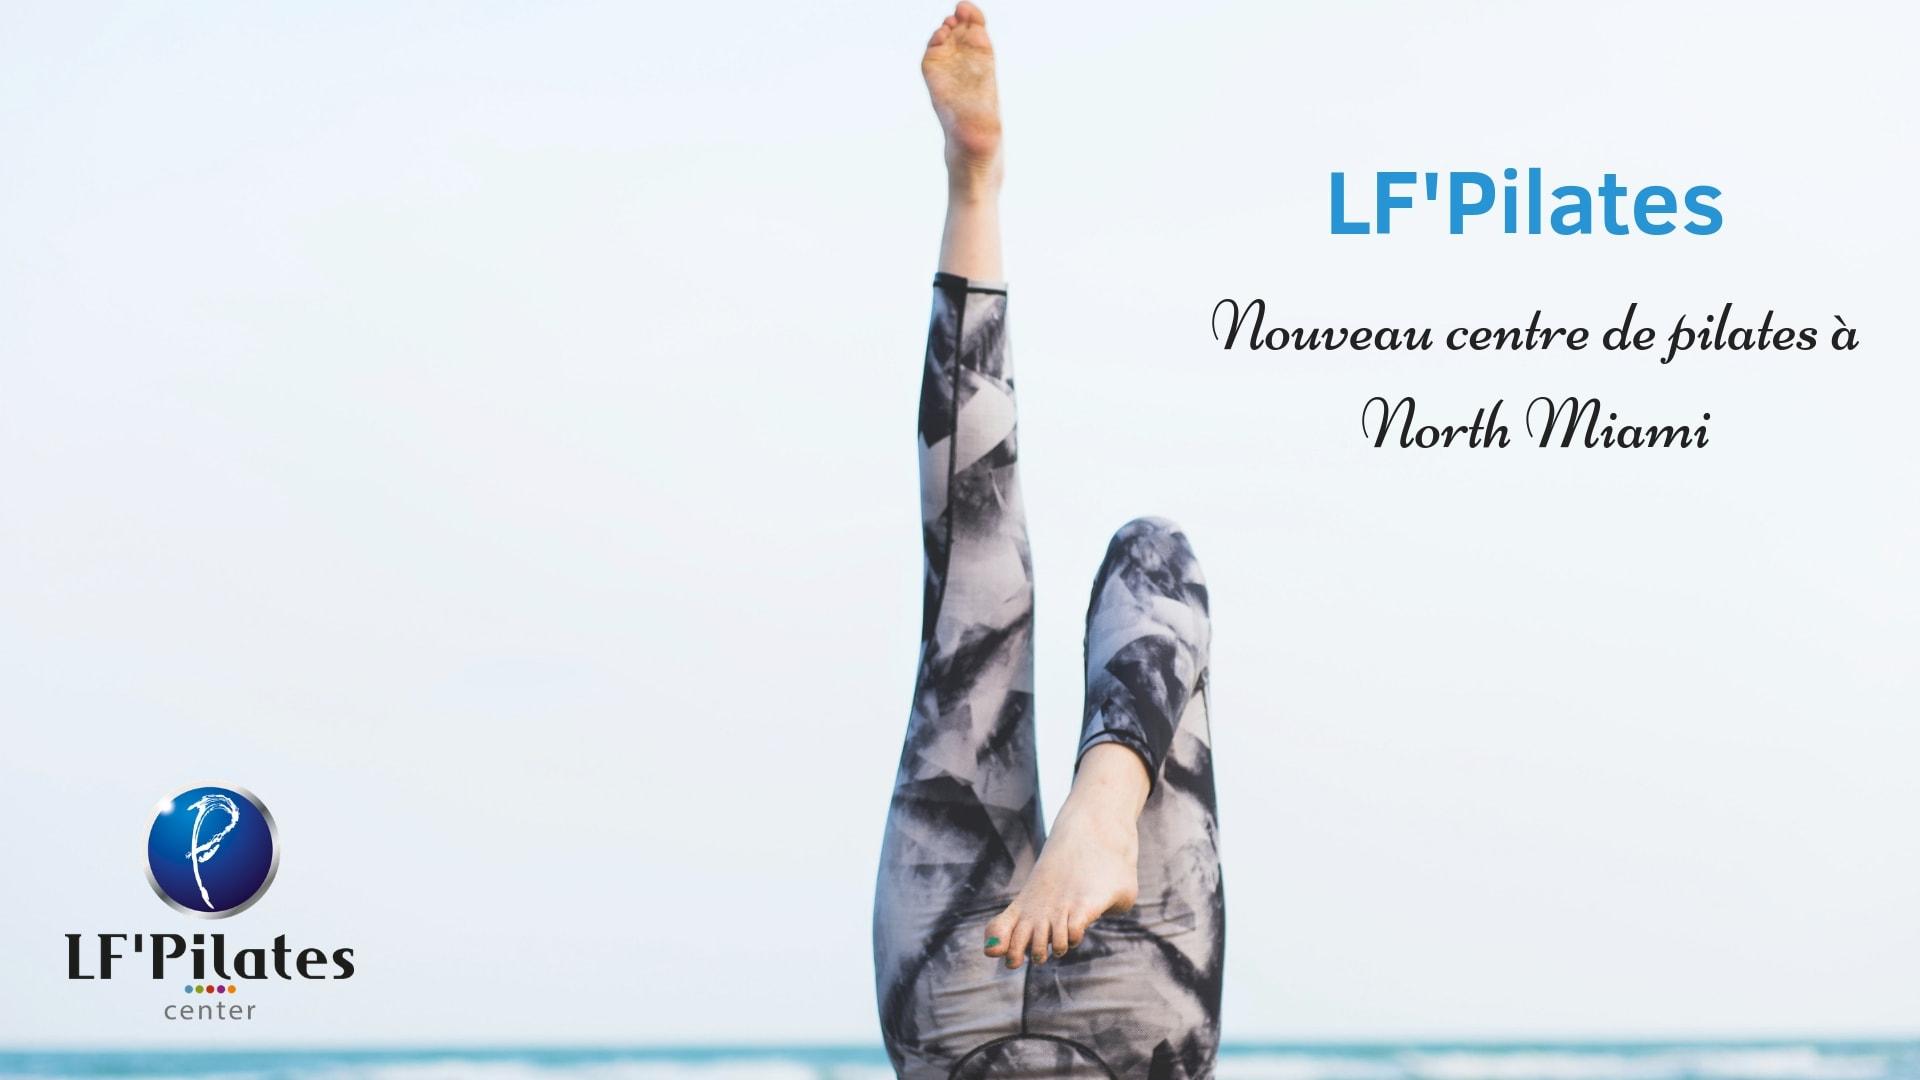 LF'pilates